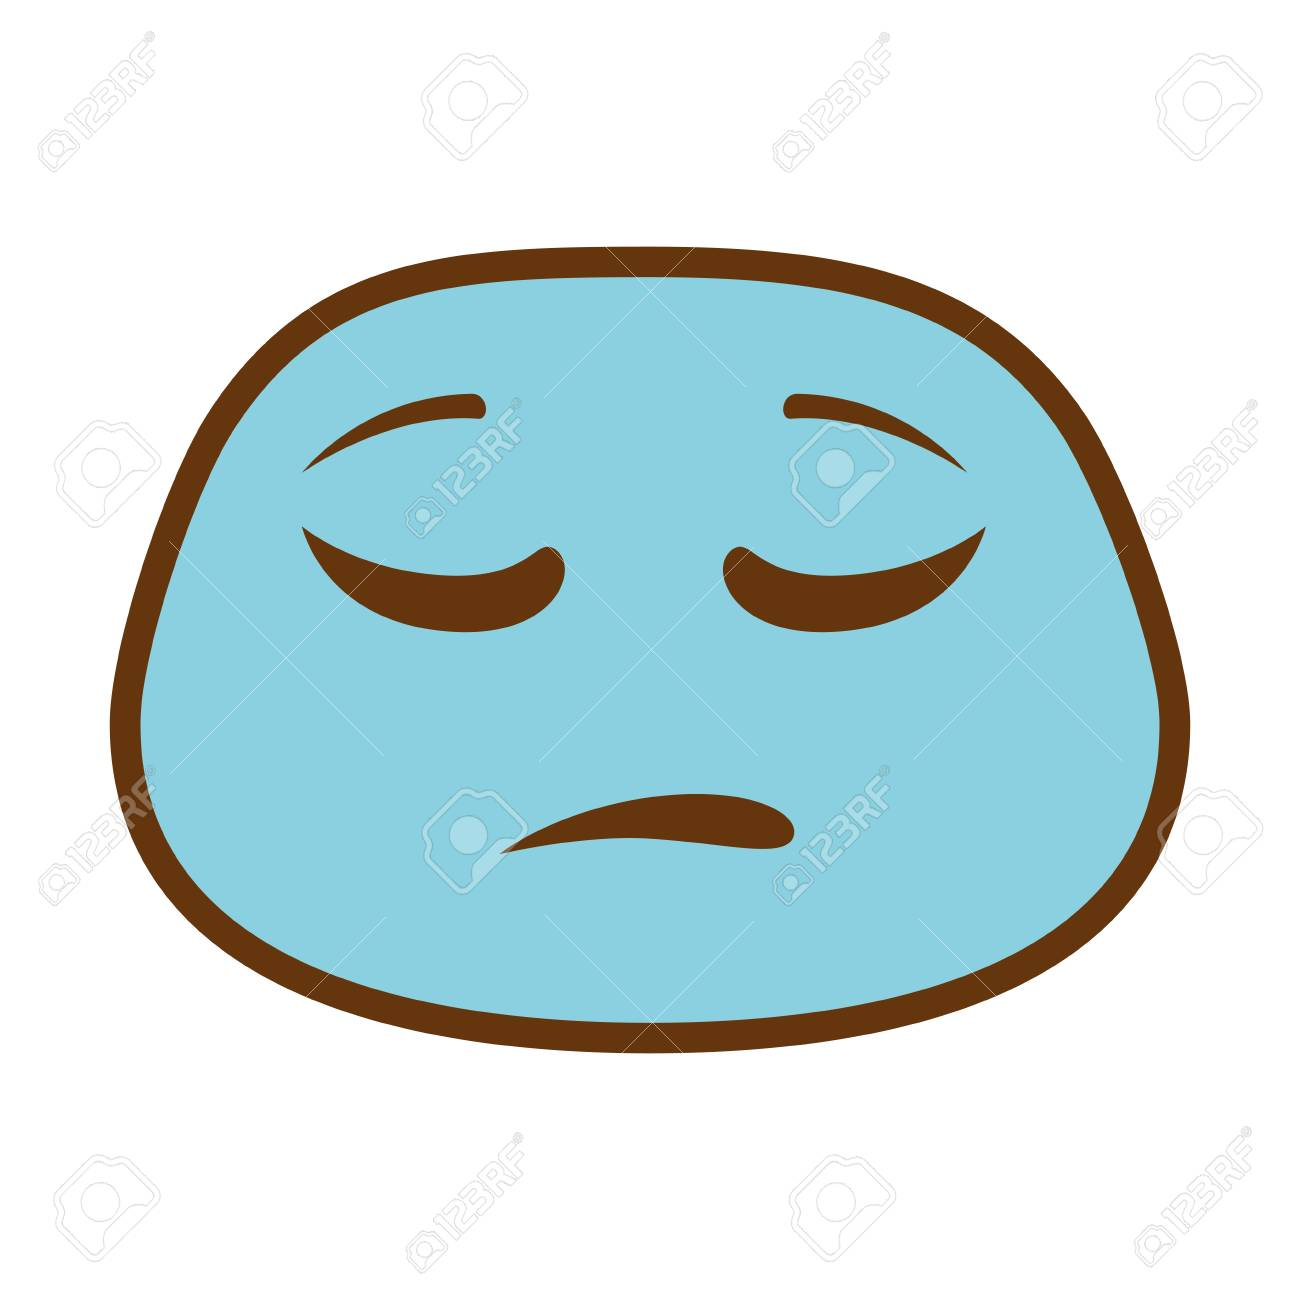 sad face emoji character vector illustration design royalty free